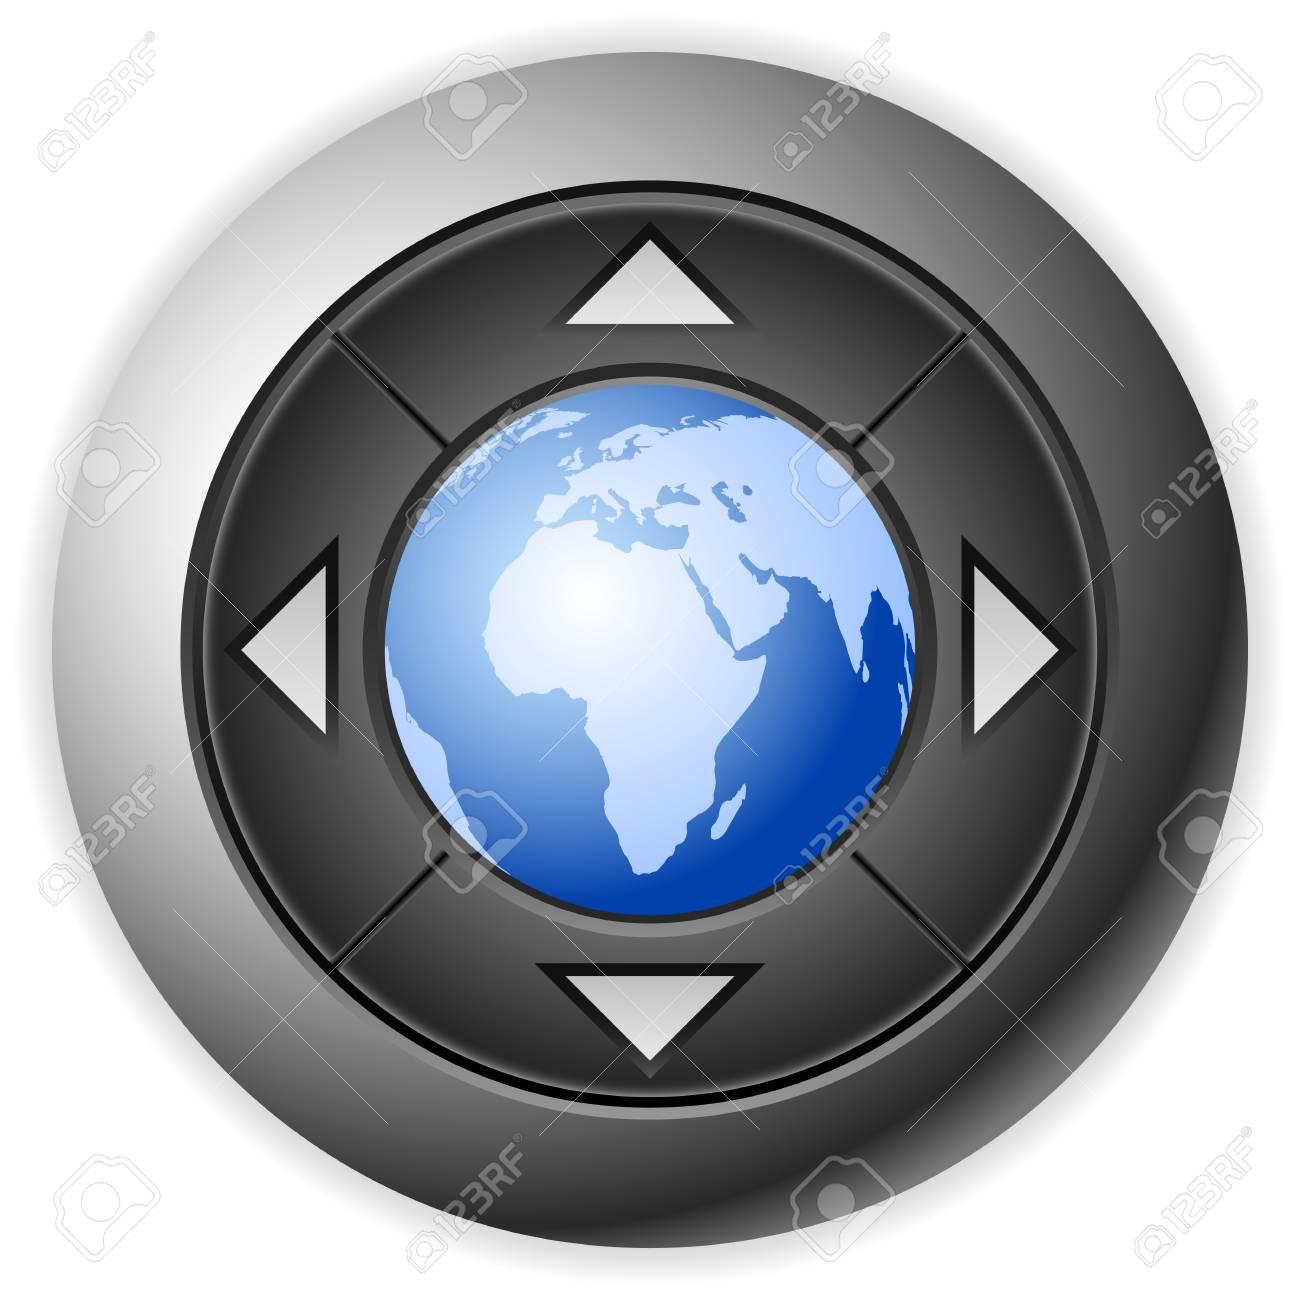 Modern multimedia button with globe. Vector illustration. Stock Vector - 9410376